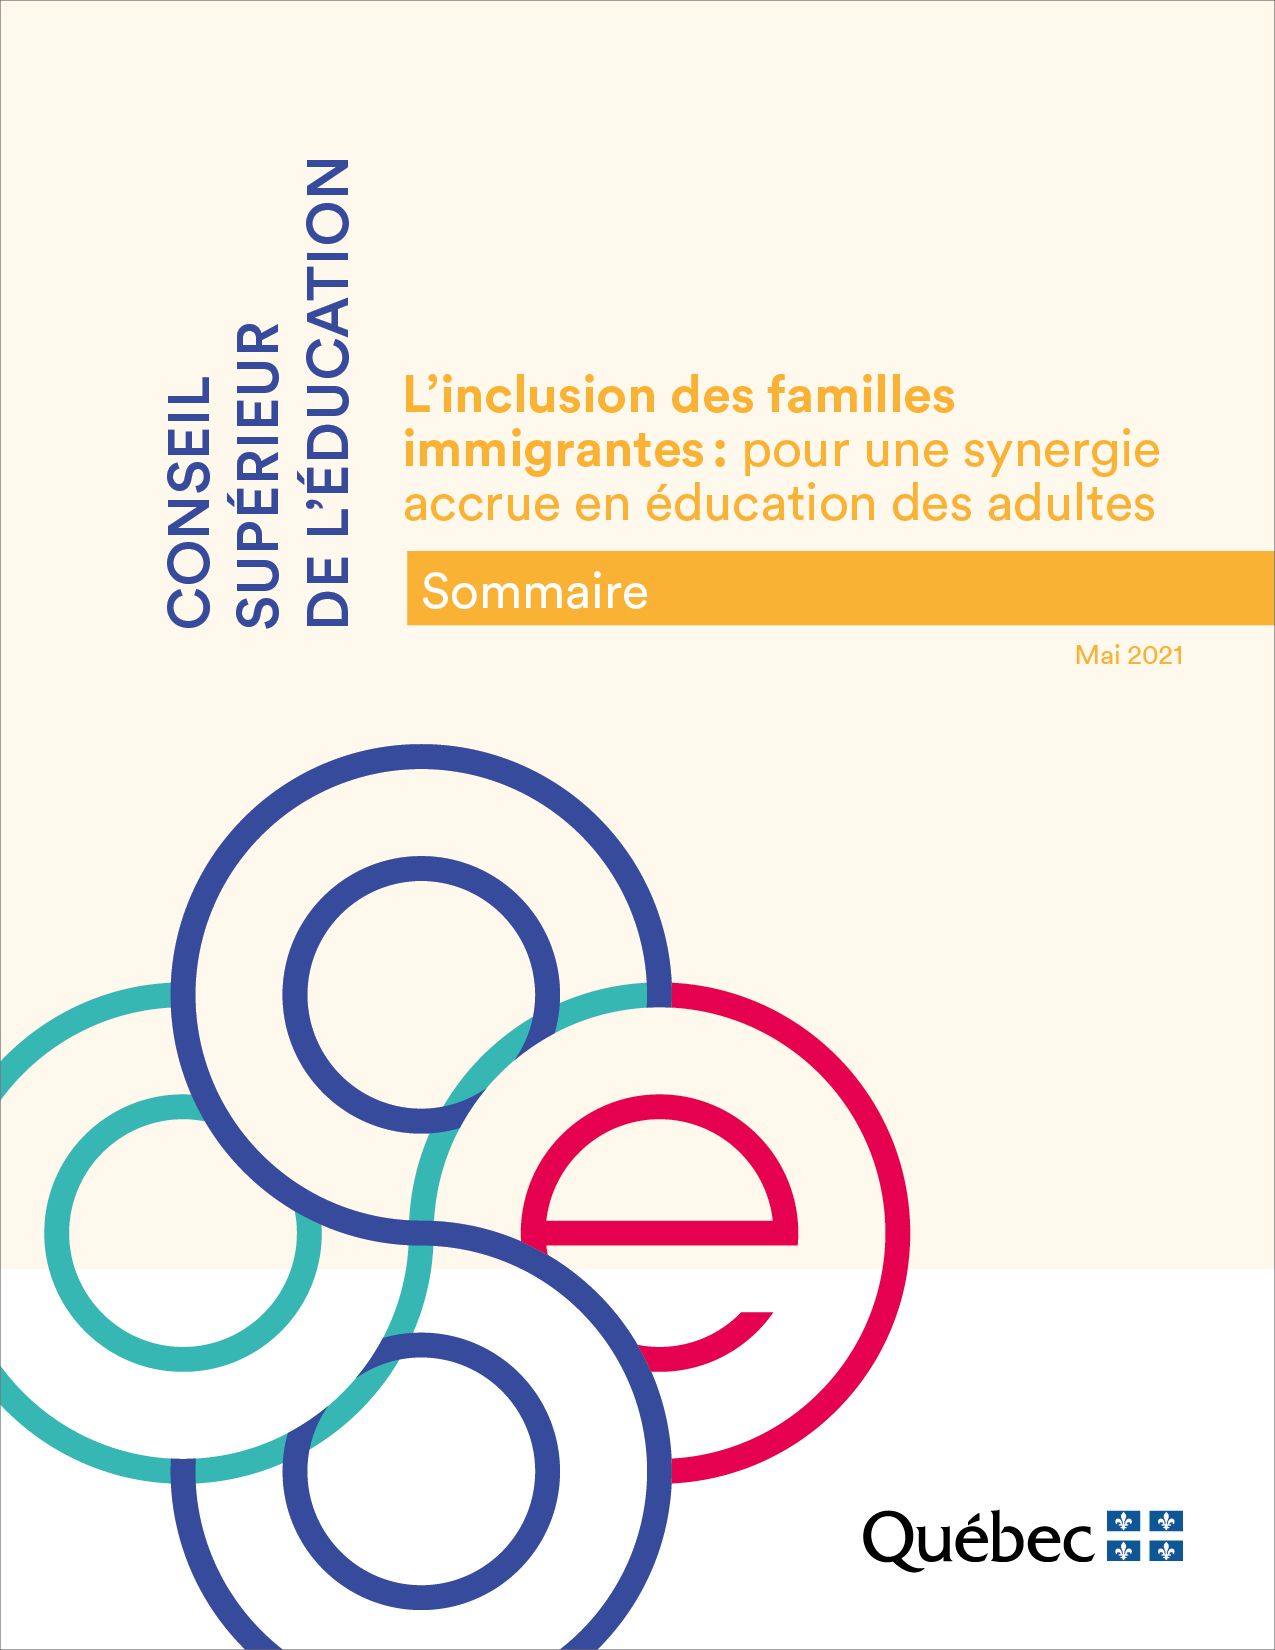 Sommaire - Inclusion des familles immigrantes